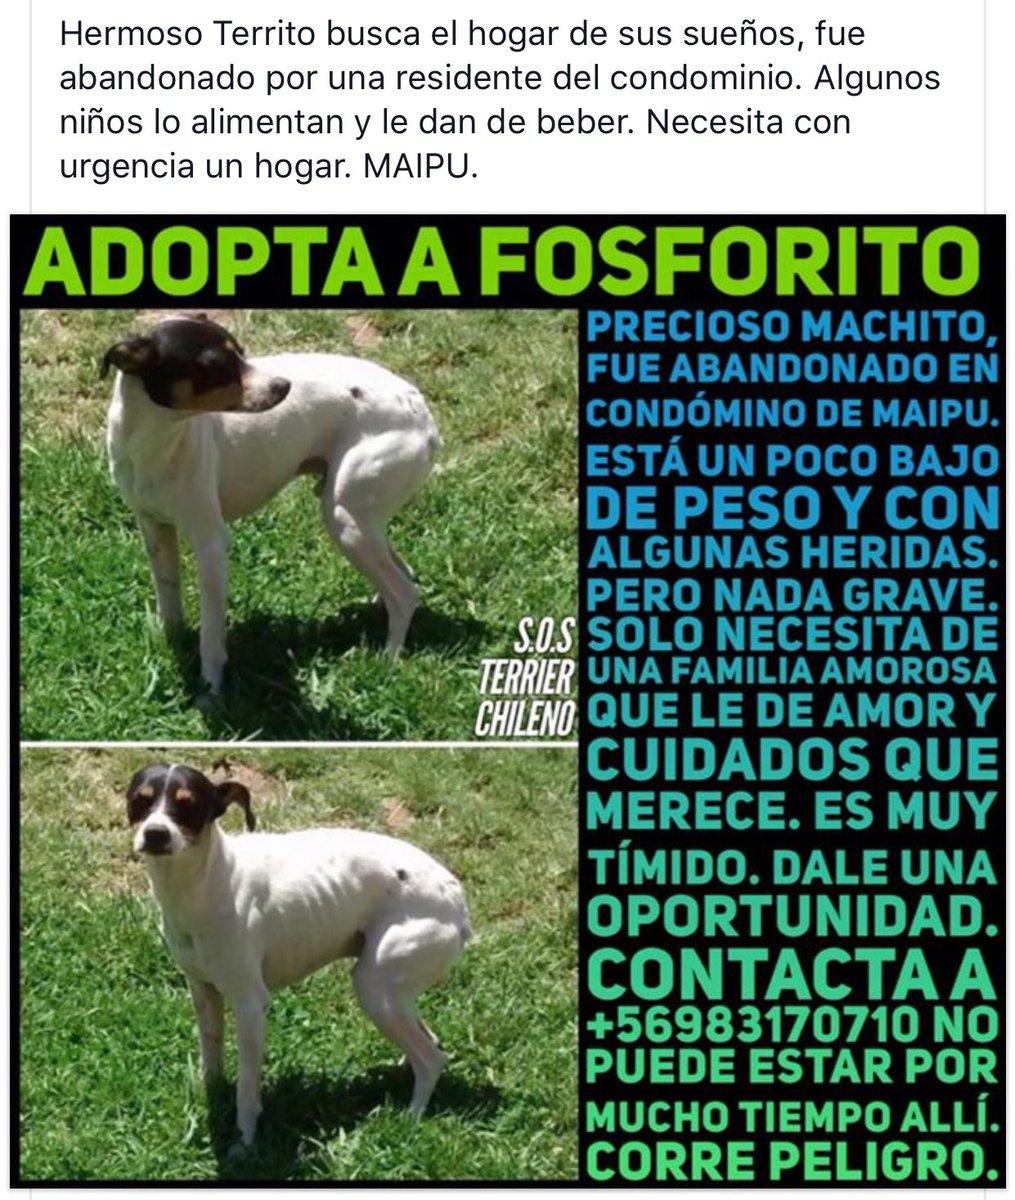 Fosforito #TerrierChileno abandonado, busca el hogar de sus sueños #Maipu @lostpets_cl @carolinapinoc @millha1907 @botaspuesta @TonkaTP RT<br>http://pic.twitter.com/314aBz8Jsr